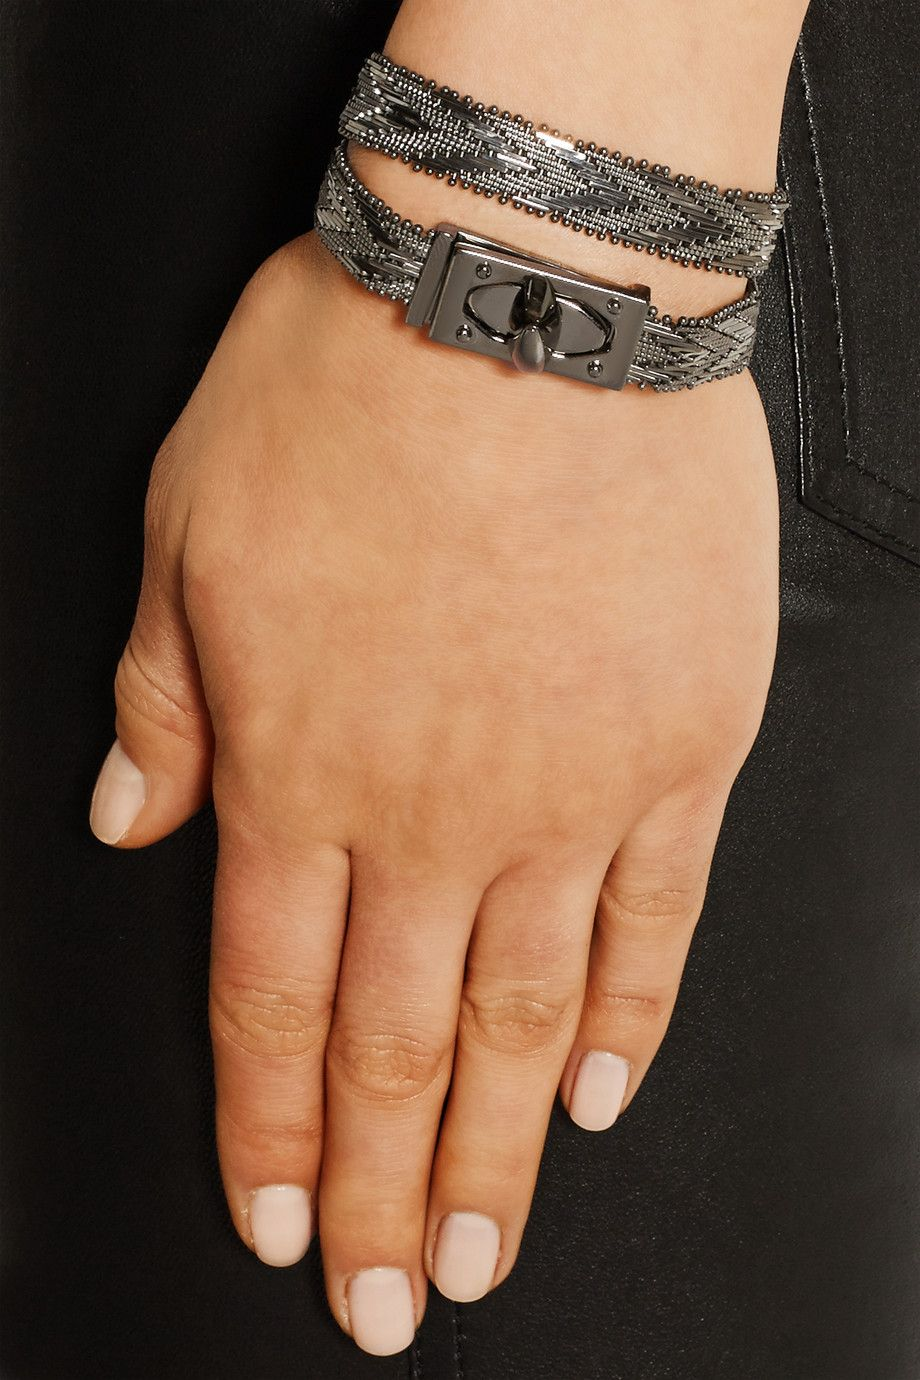 Givenchy shark lock rutheniumtone wrap bracelet baubles